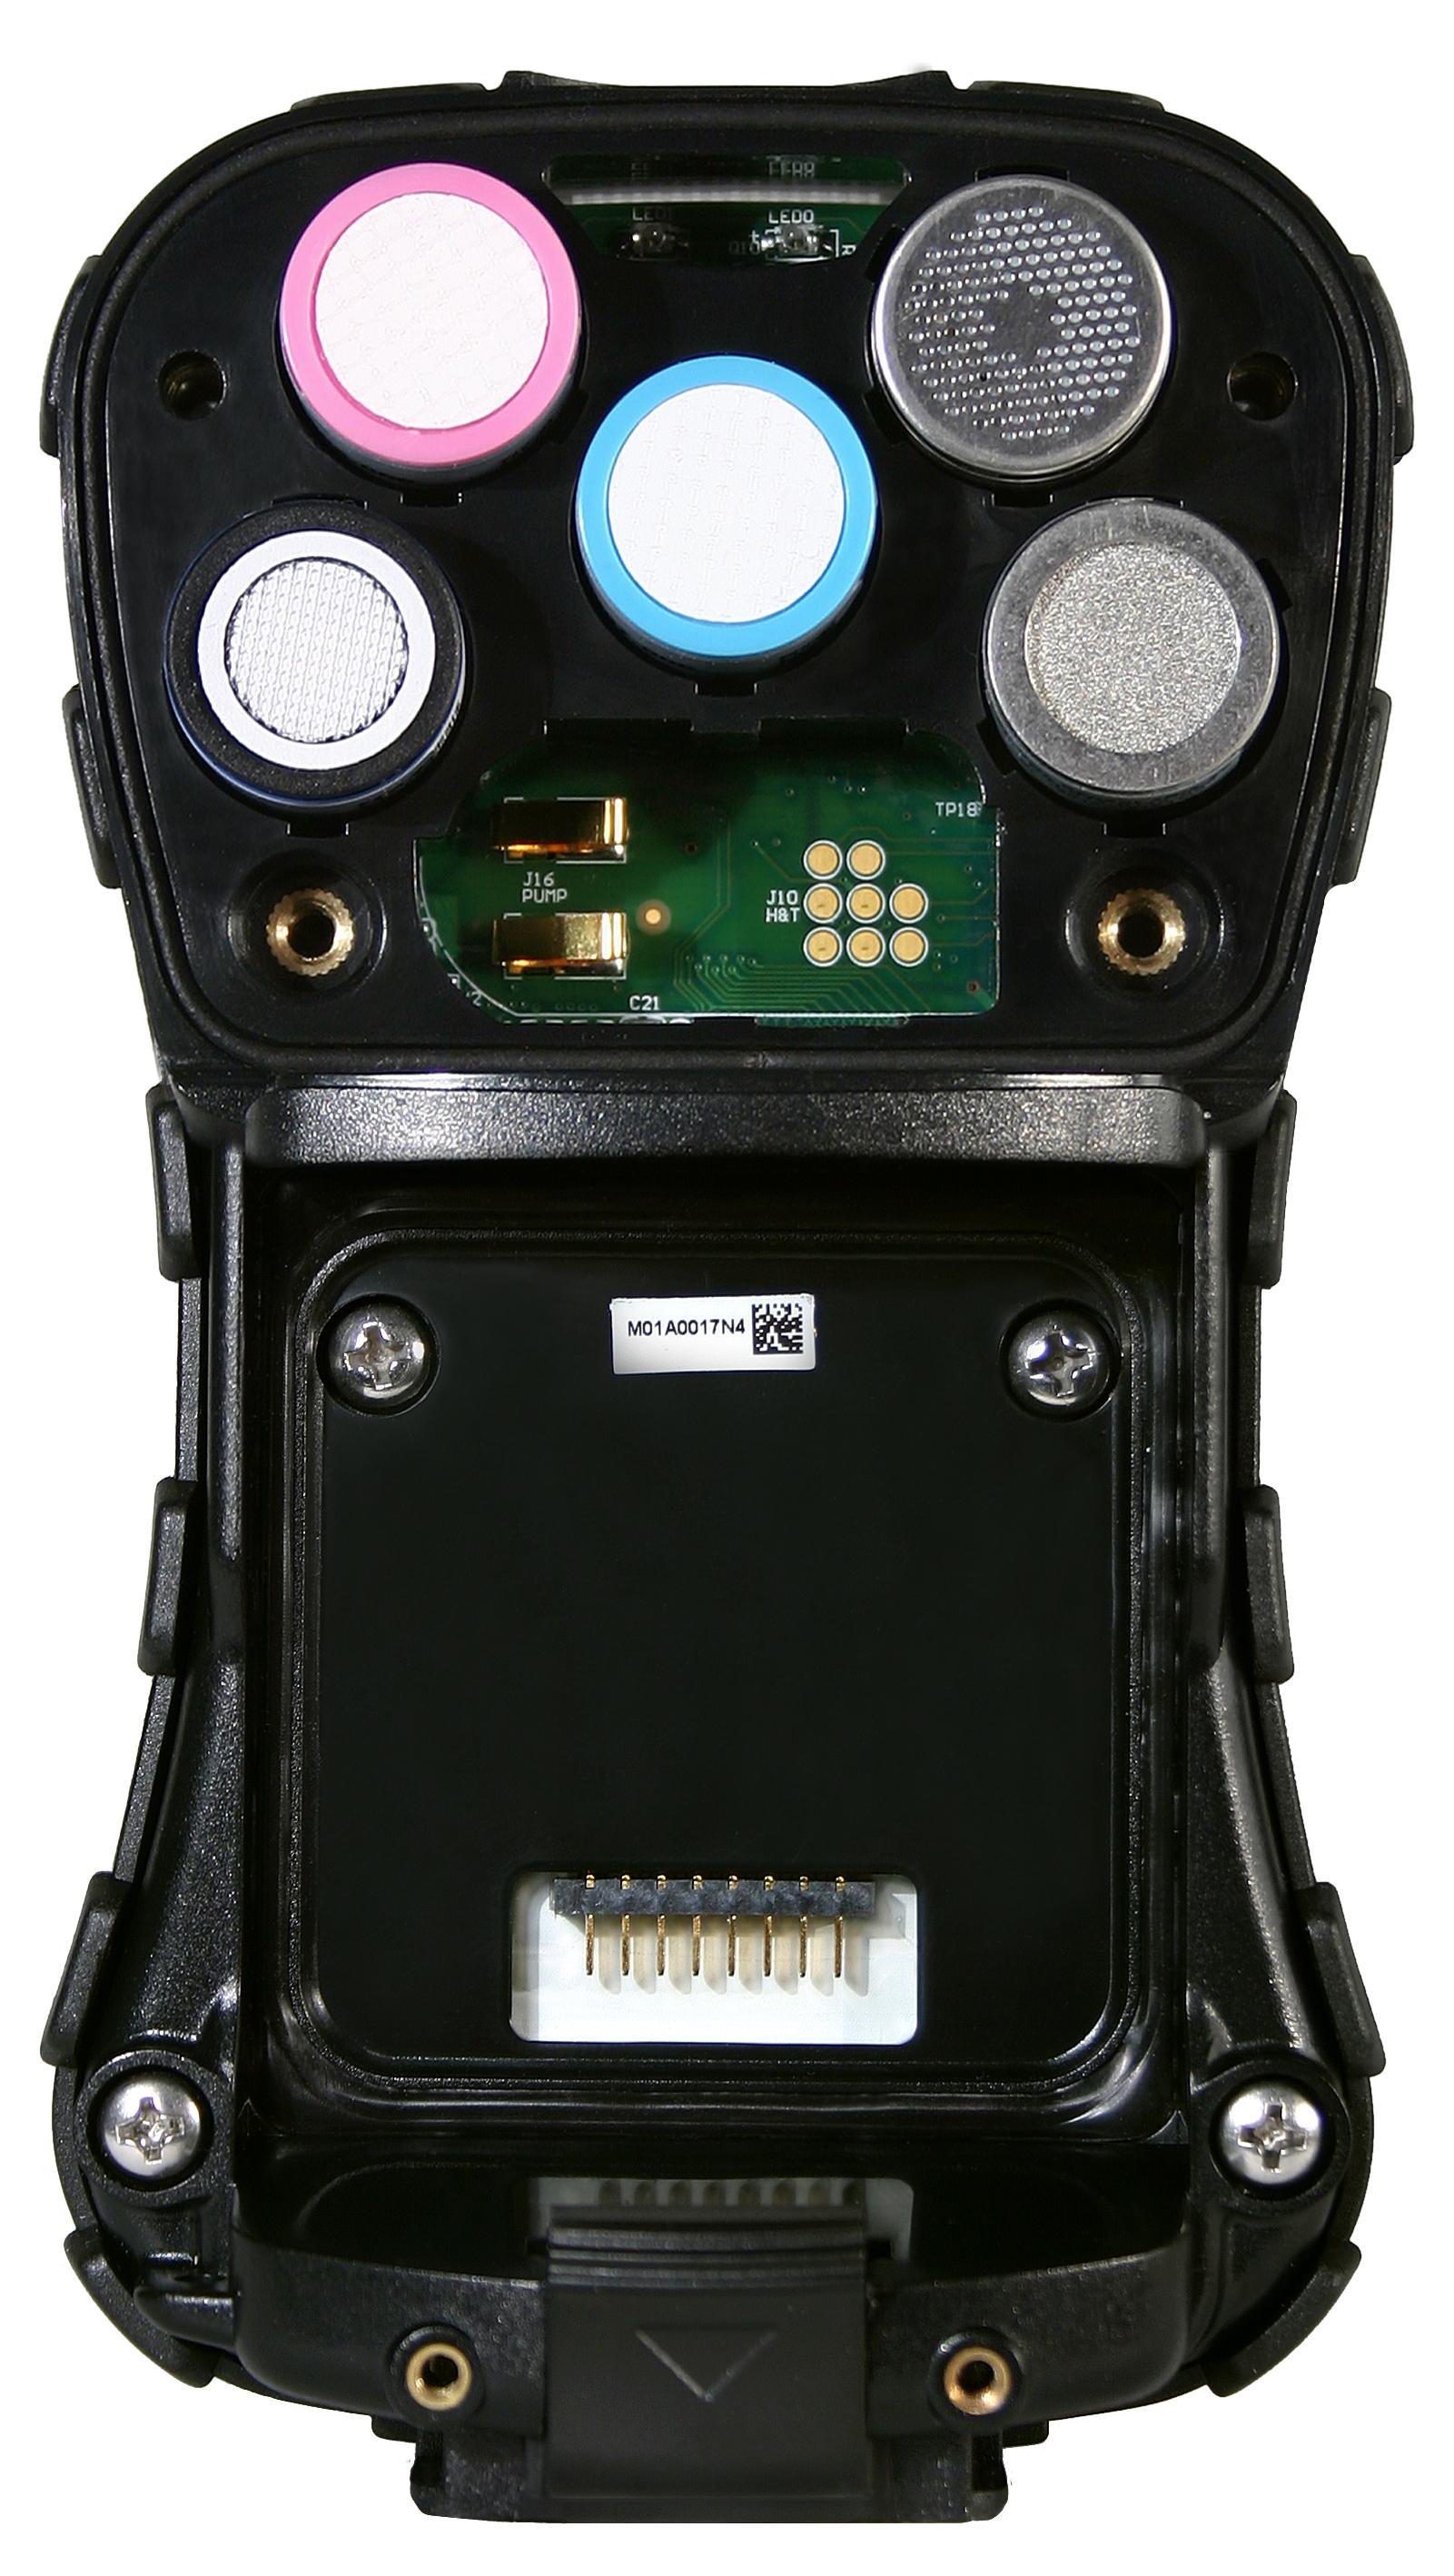 Rae Systems Multirae Pro